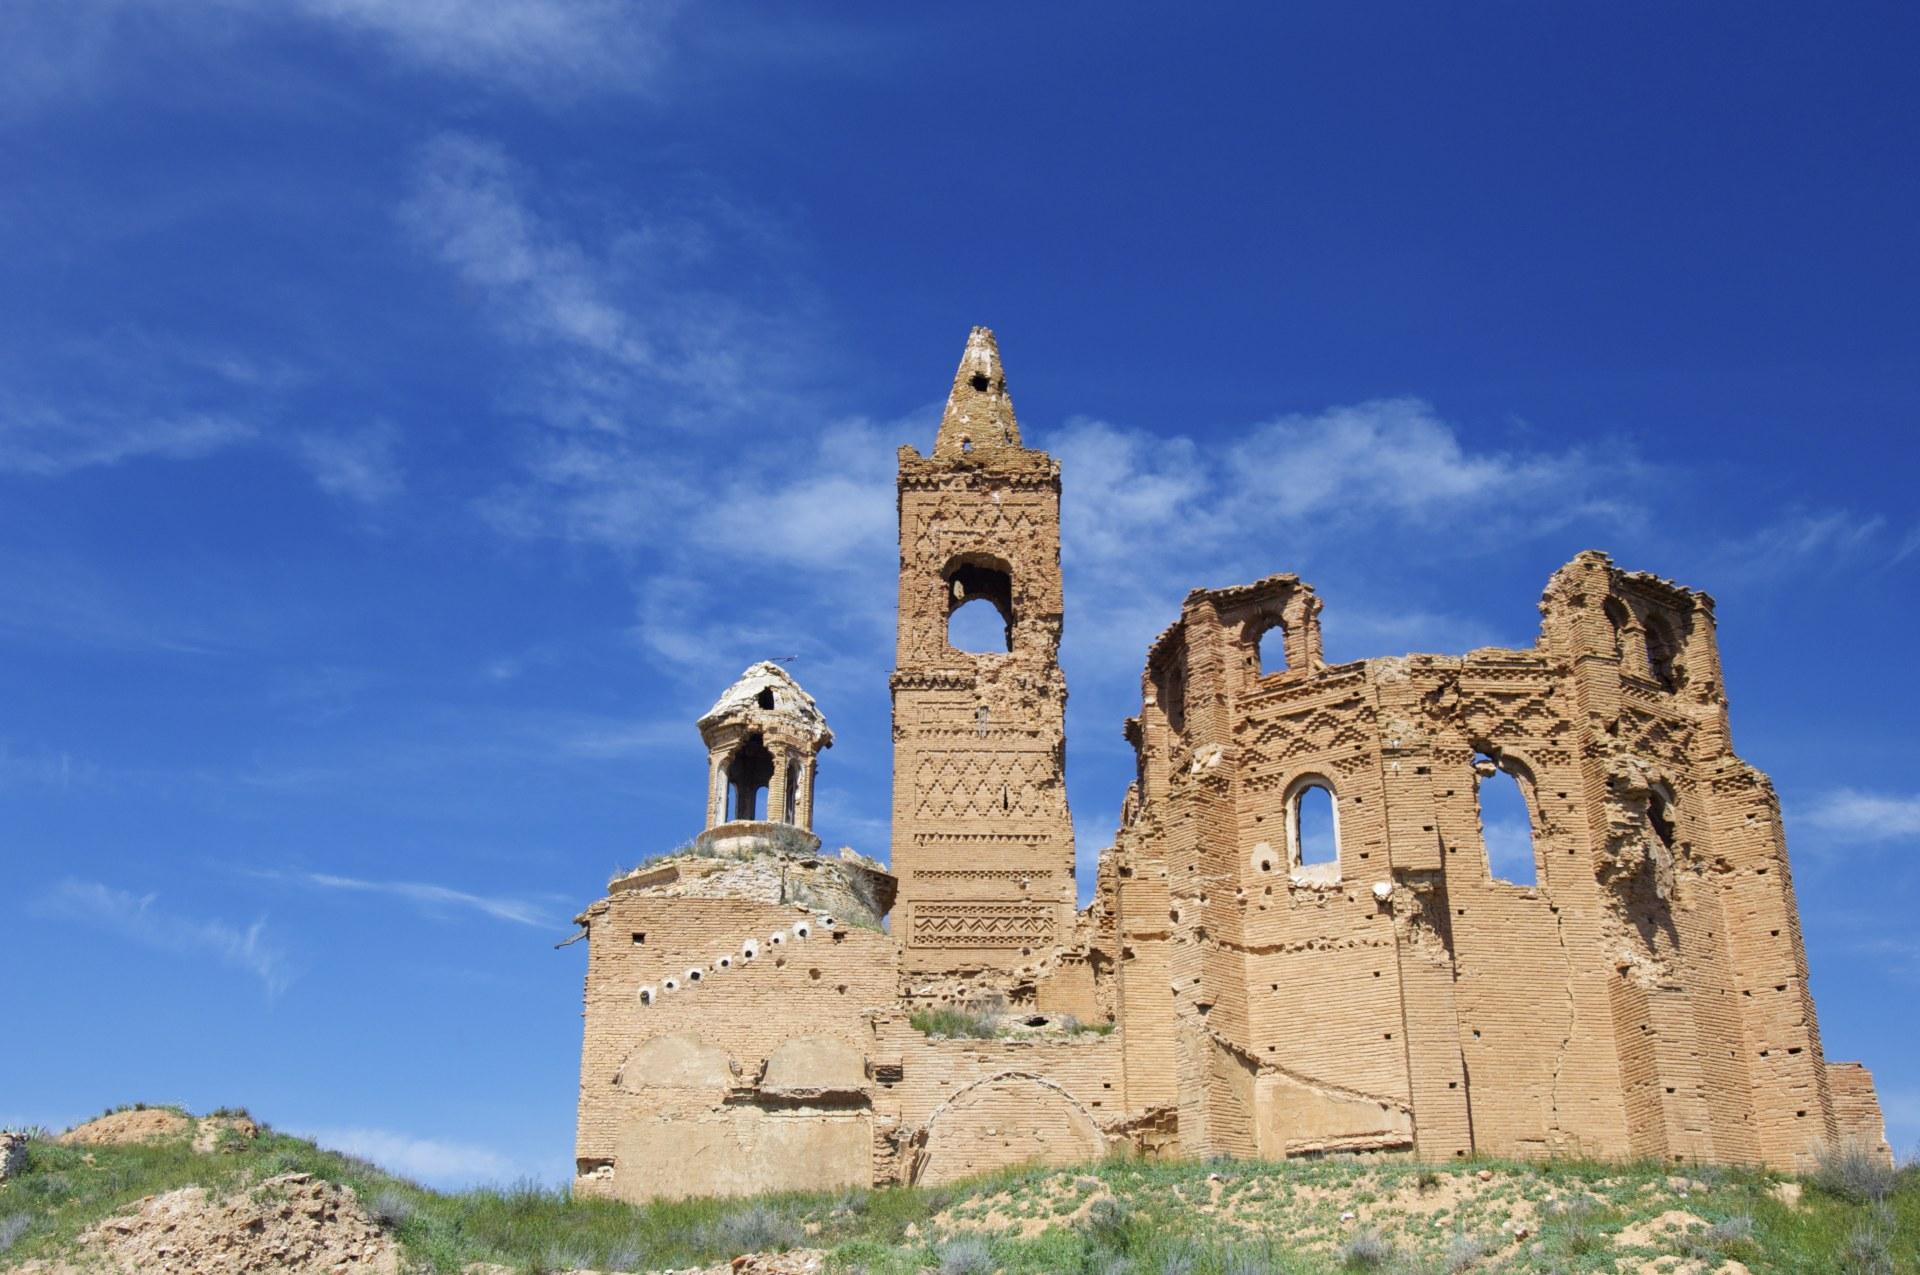 church demolished in Belchite, Spain